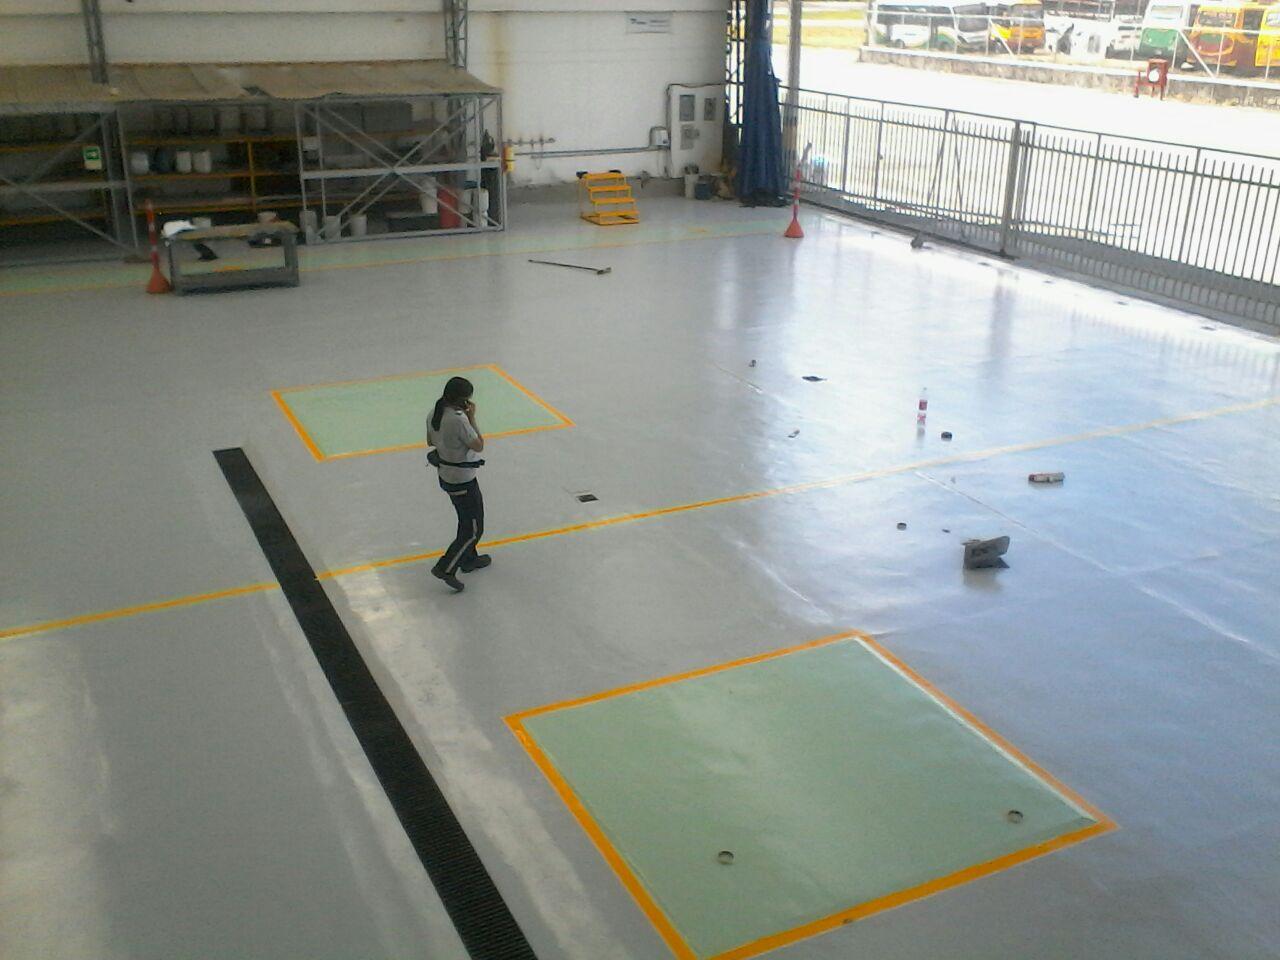 Pisos industriales pintura ep xica para hangar - Aplicacion de microcemento en paredes ...